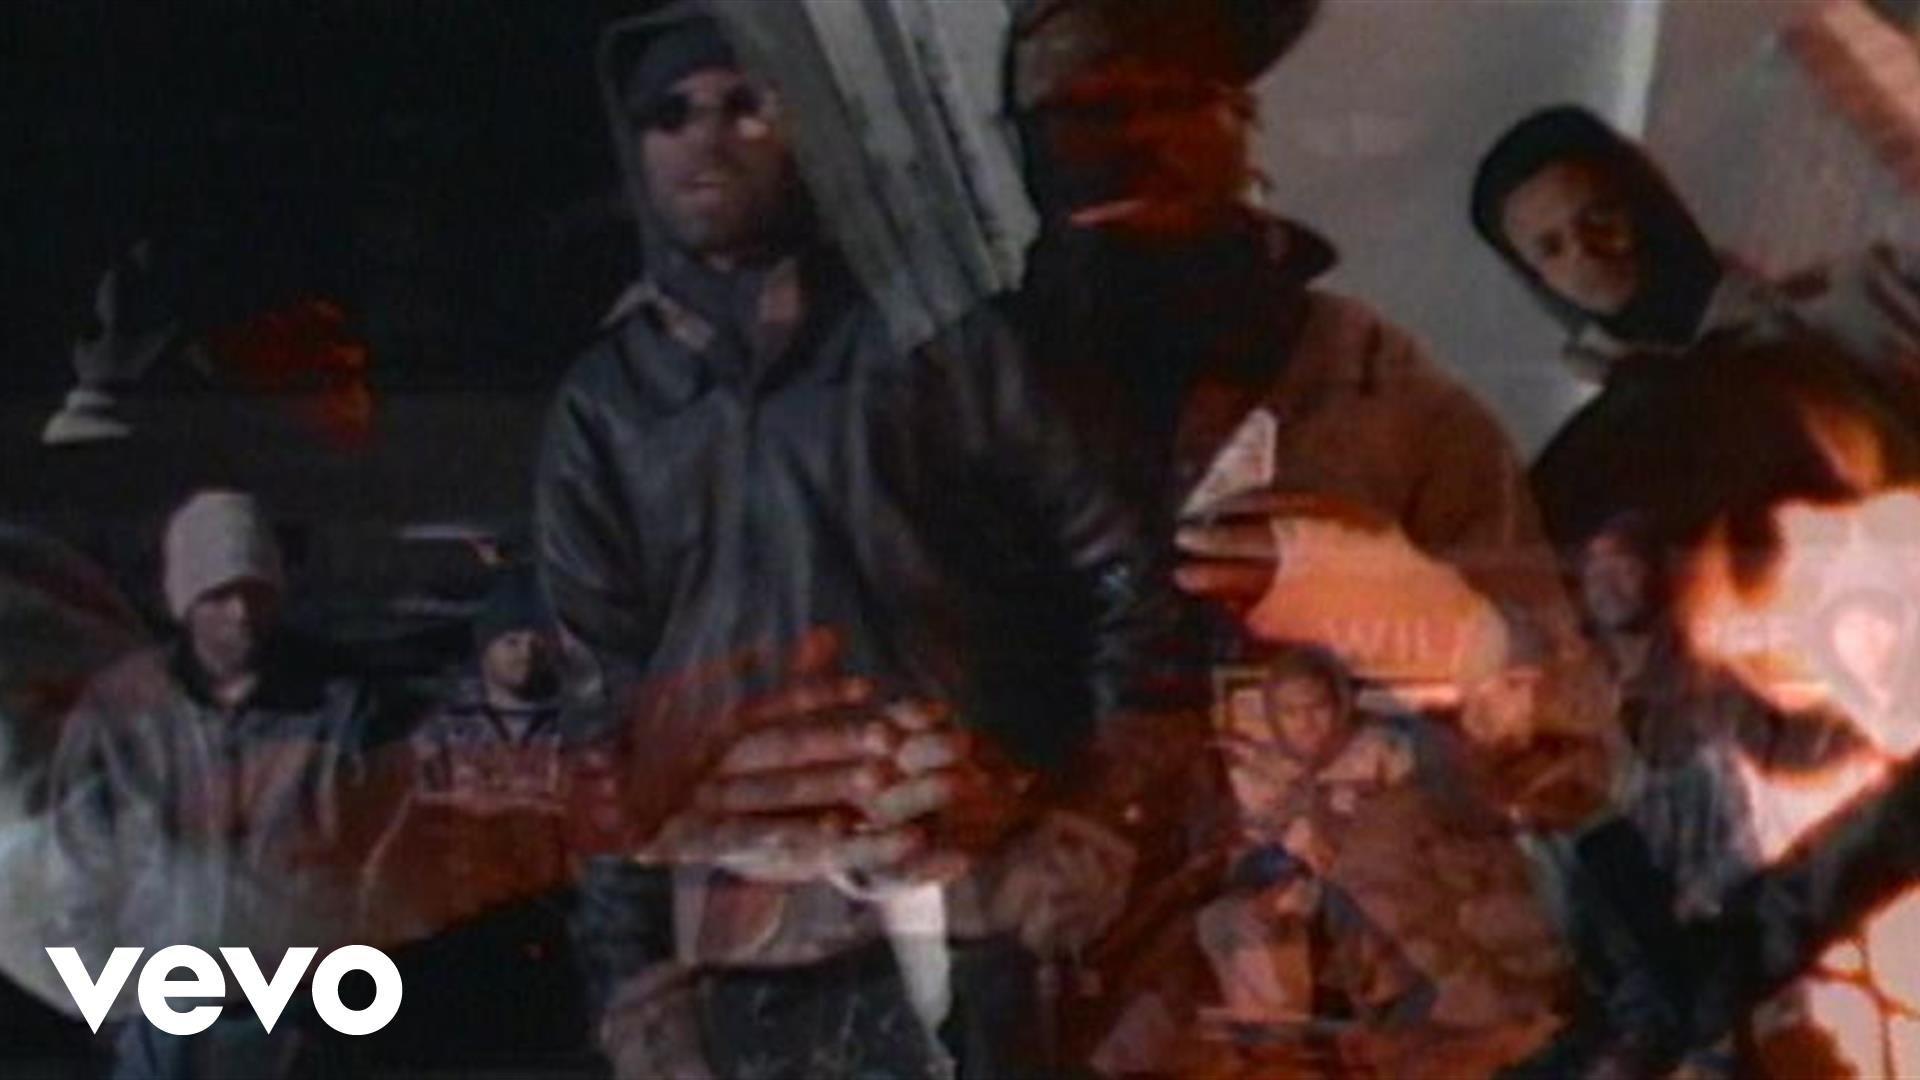 Wu-Tang Clan – C.R.E.A.M.